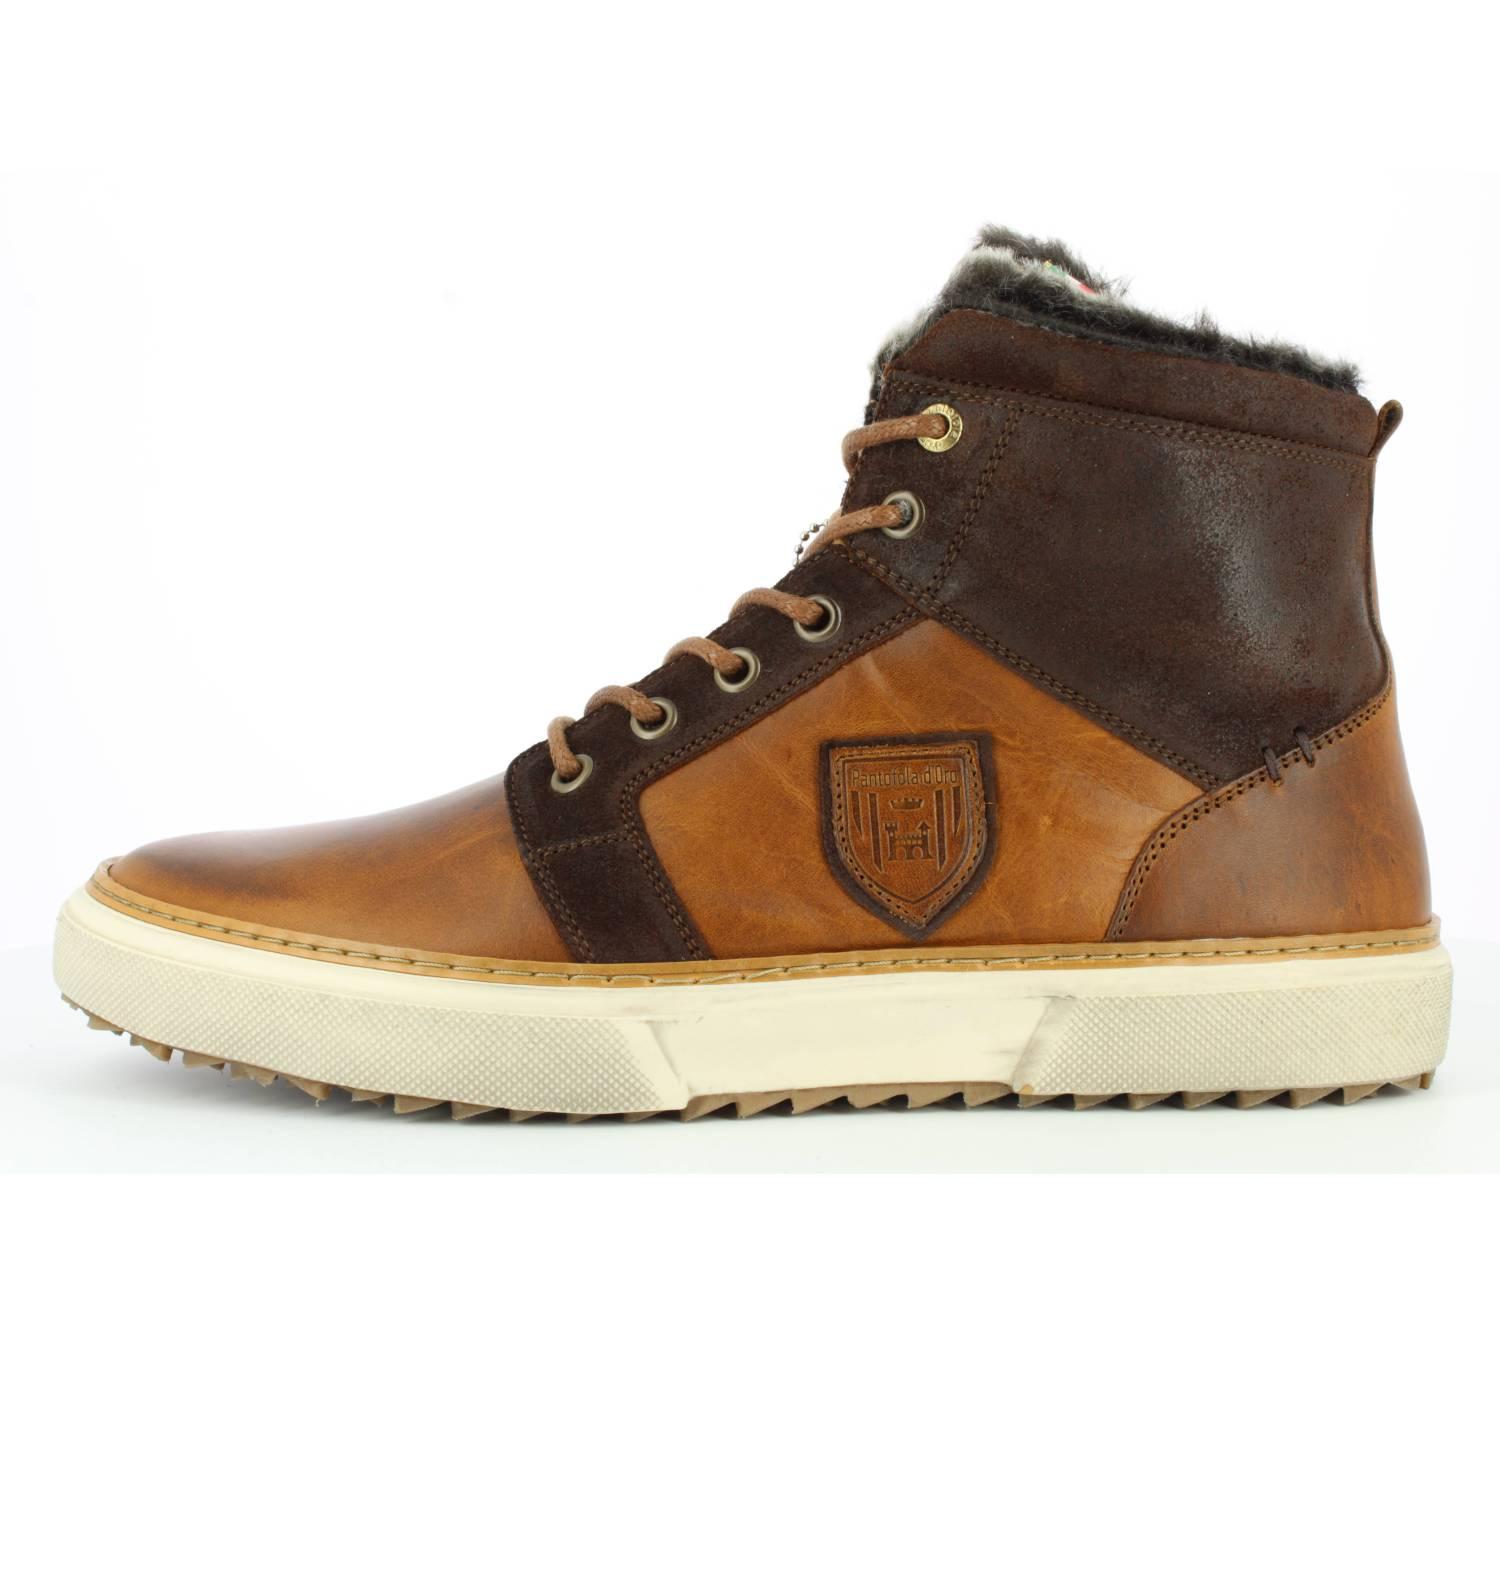 Pantofola d'Oro Benevento Uomo Fur Mid braun Tortoise Shell Low Sneaker Herren